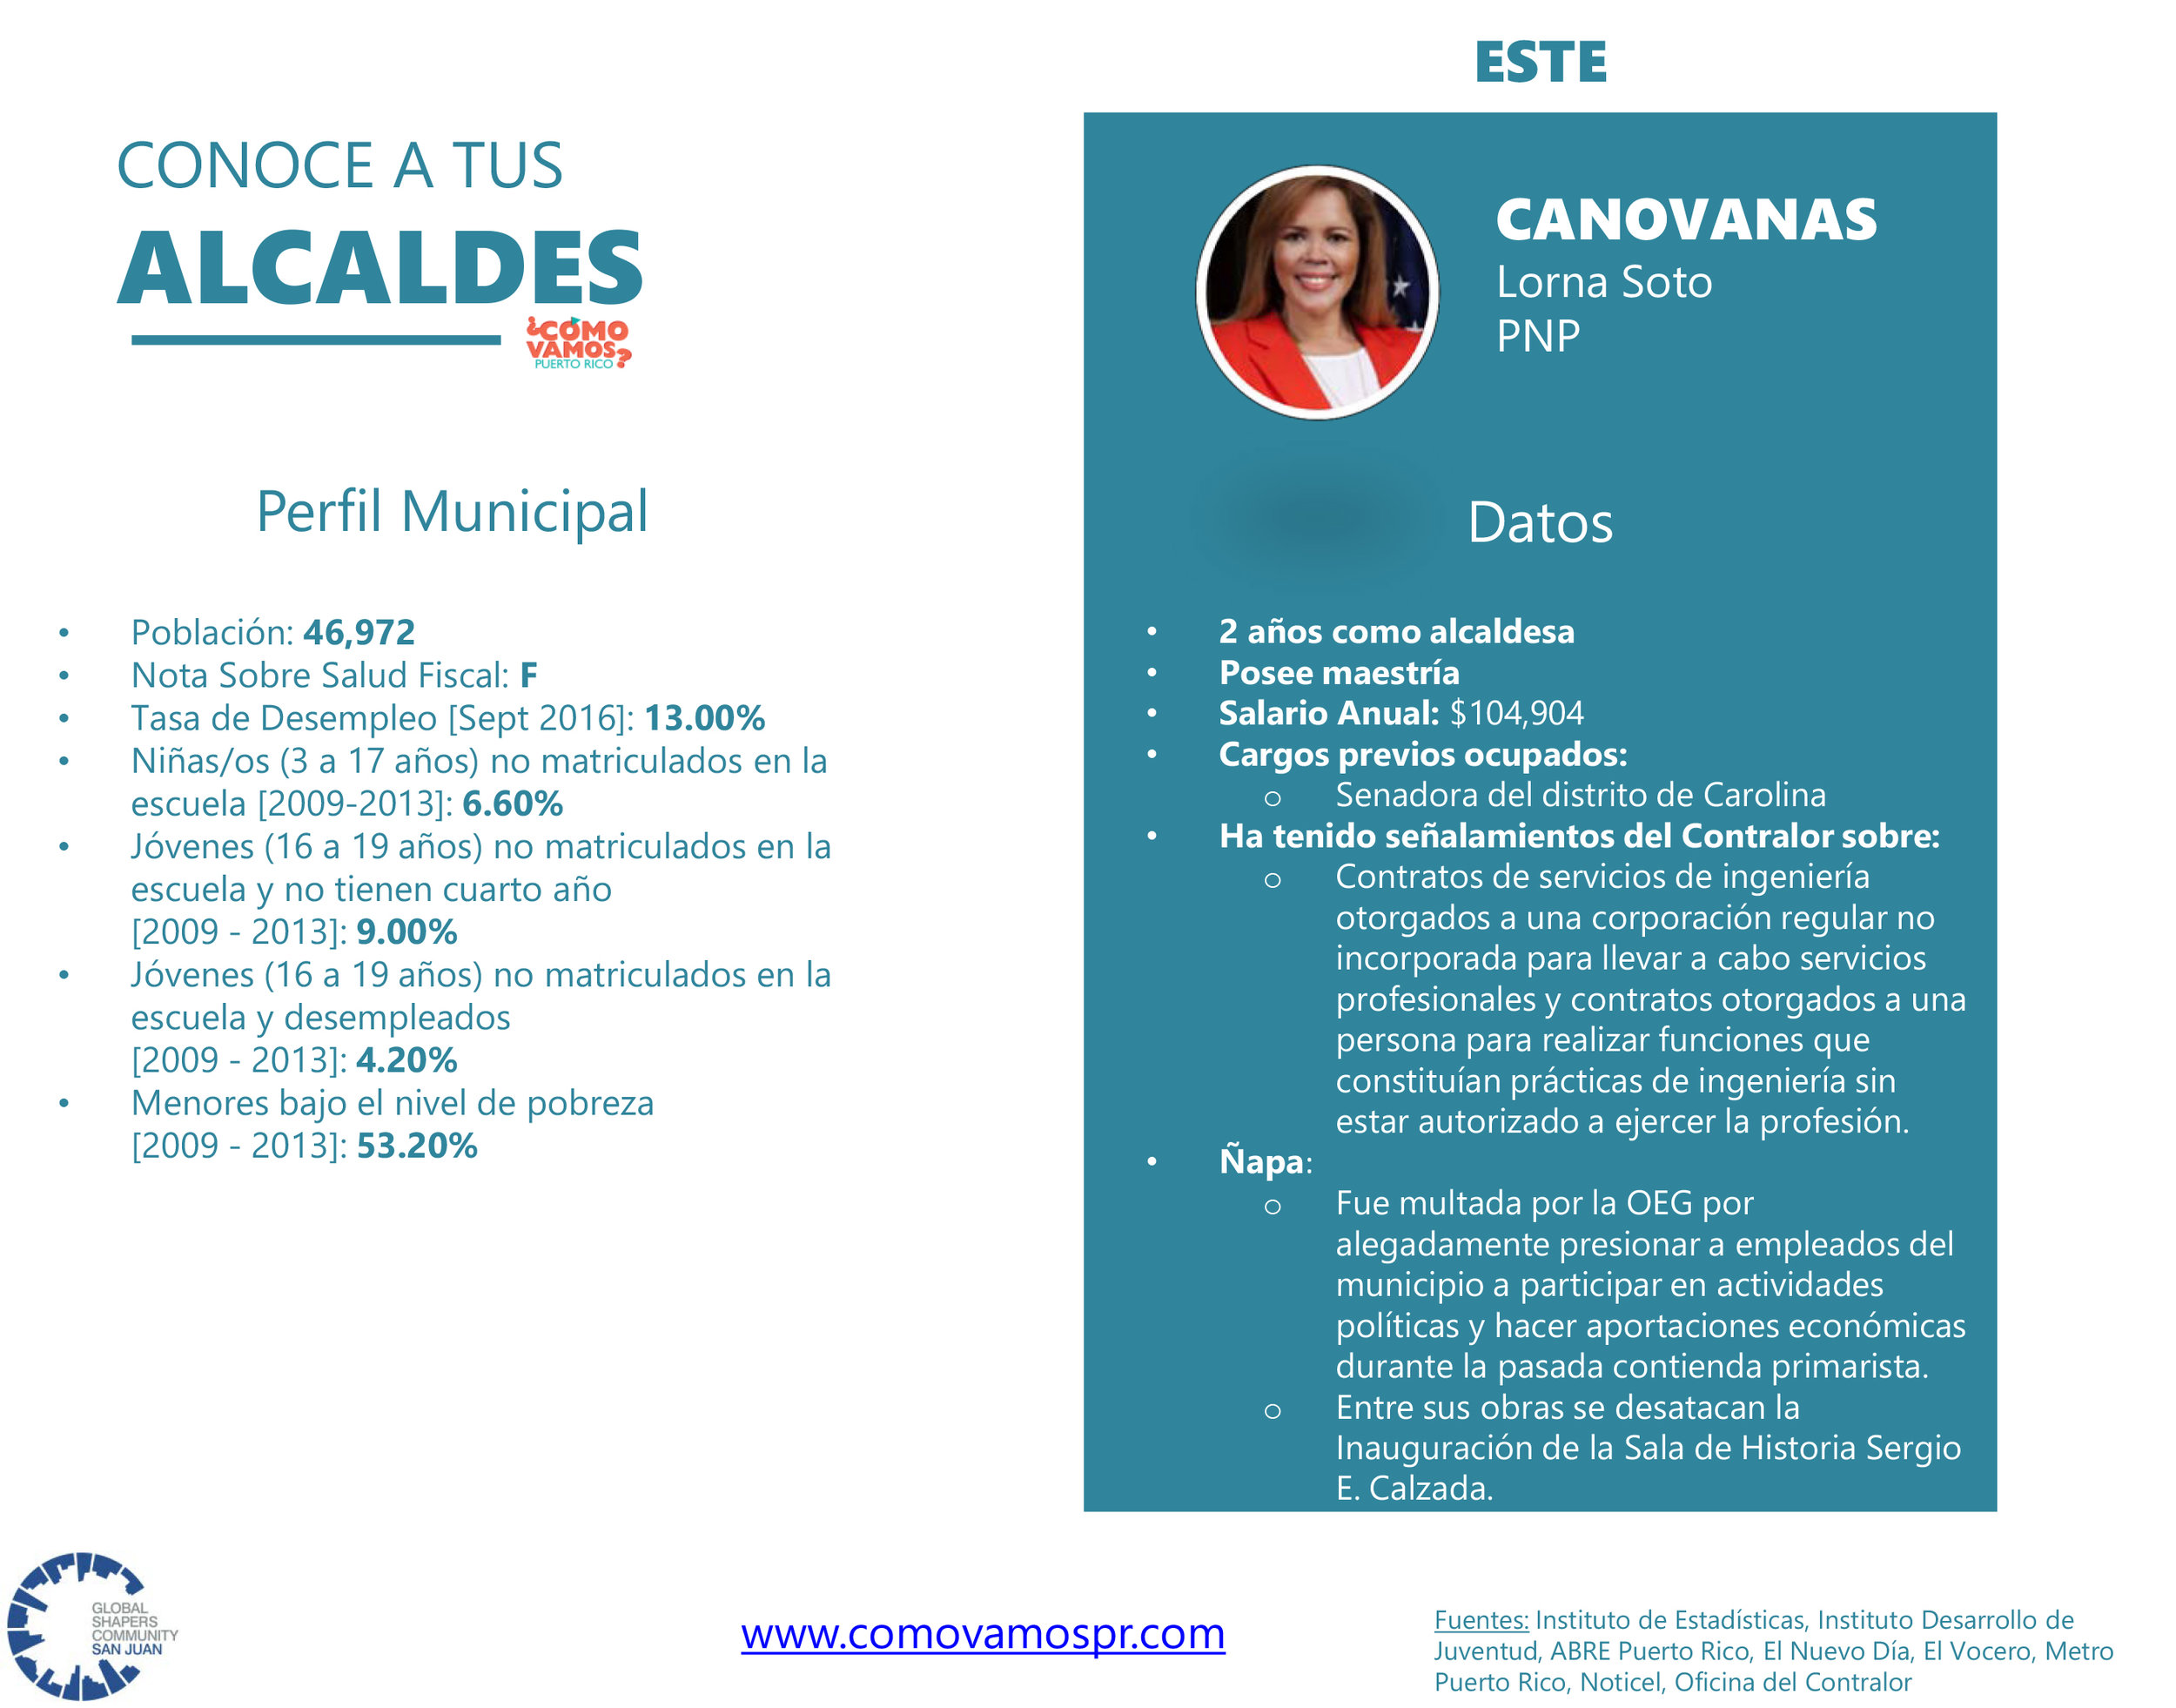 Alcaldes_Este_Canóvanas.jpg